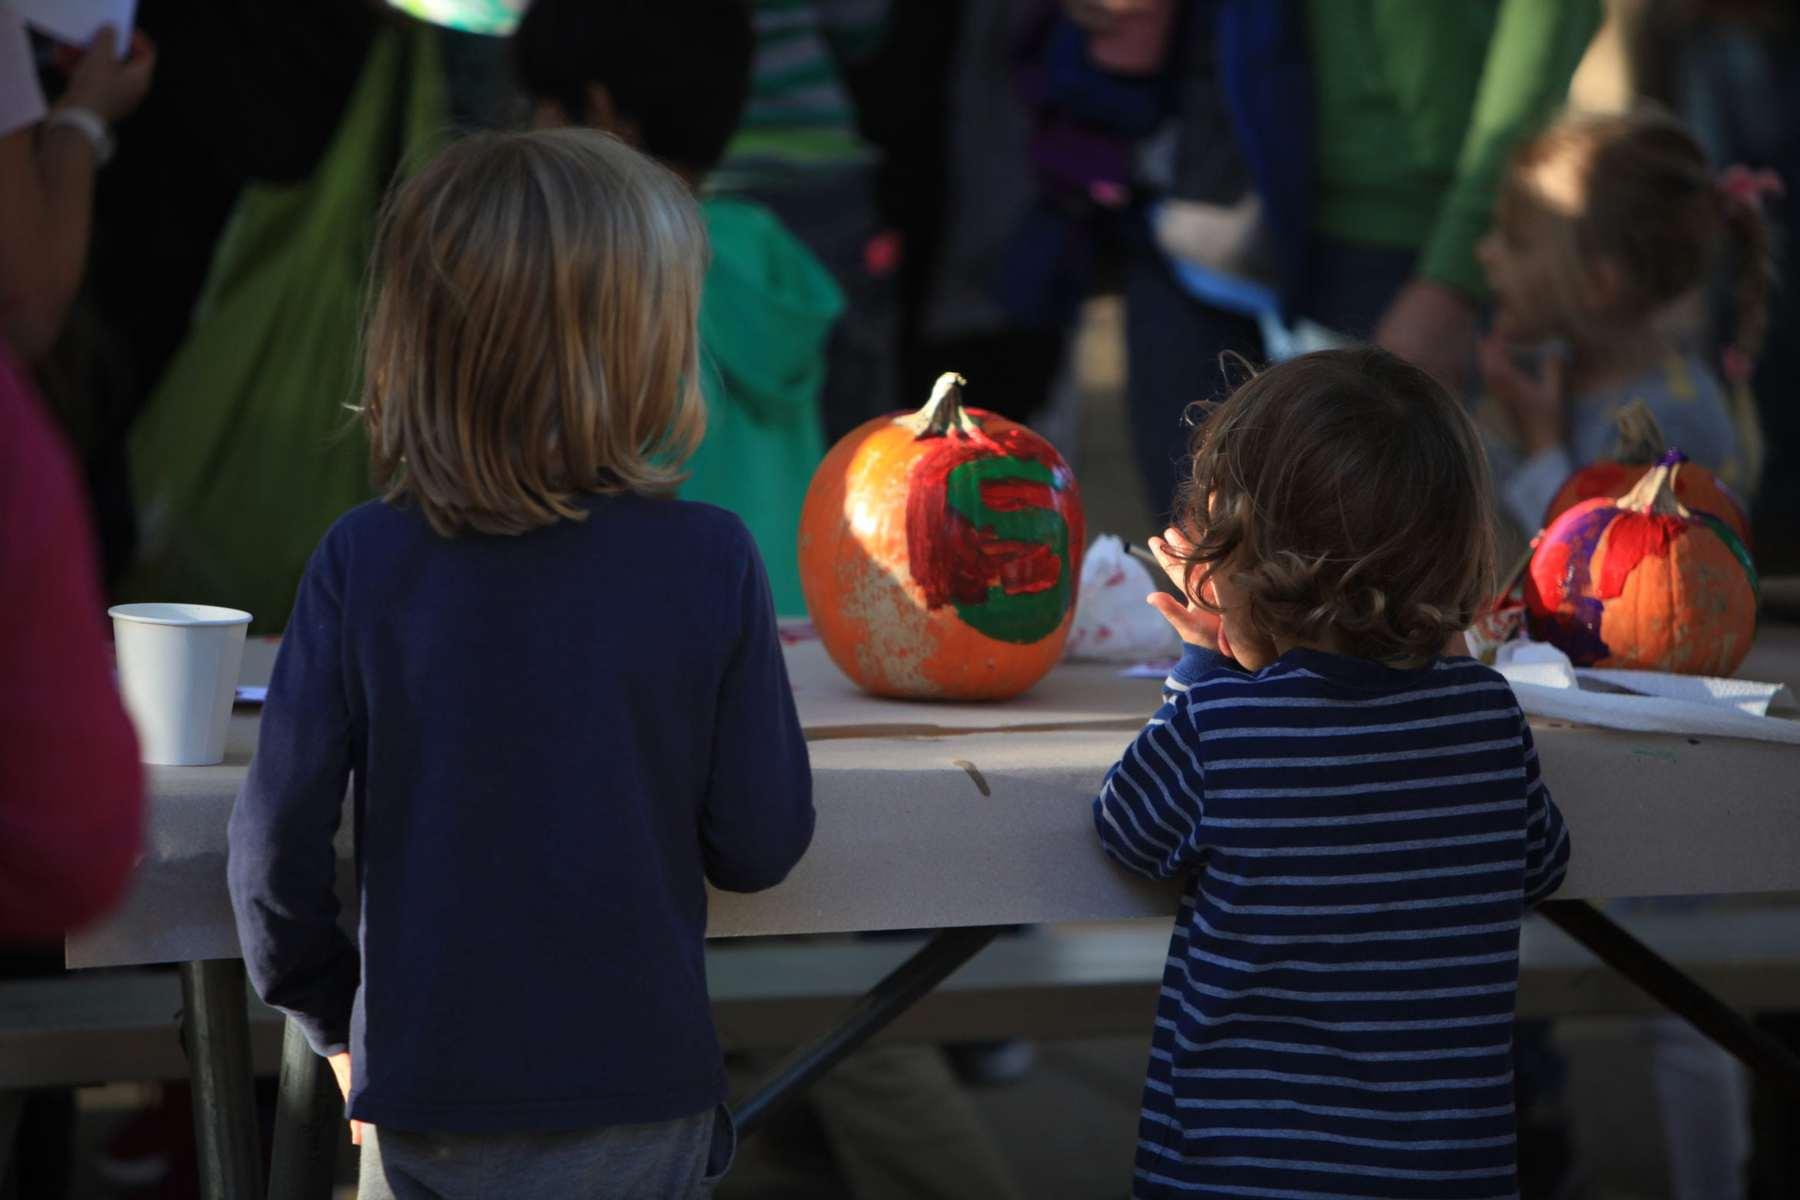 Scenes from the 2017 Greenbelt Pumpkin Festival in Greenbelt, MD. Photo by Karl Gary